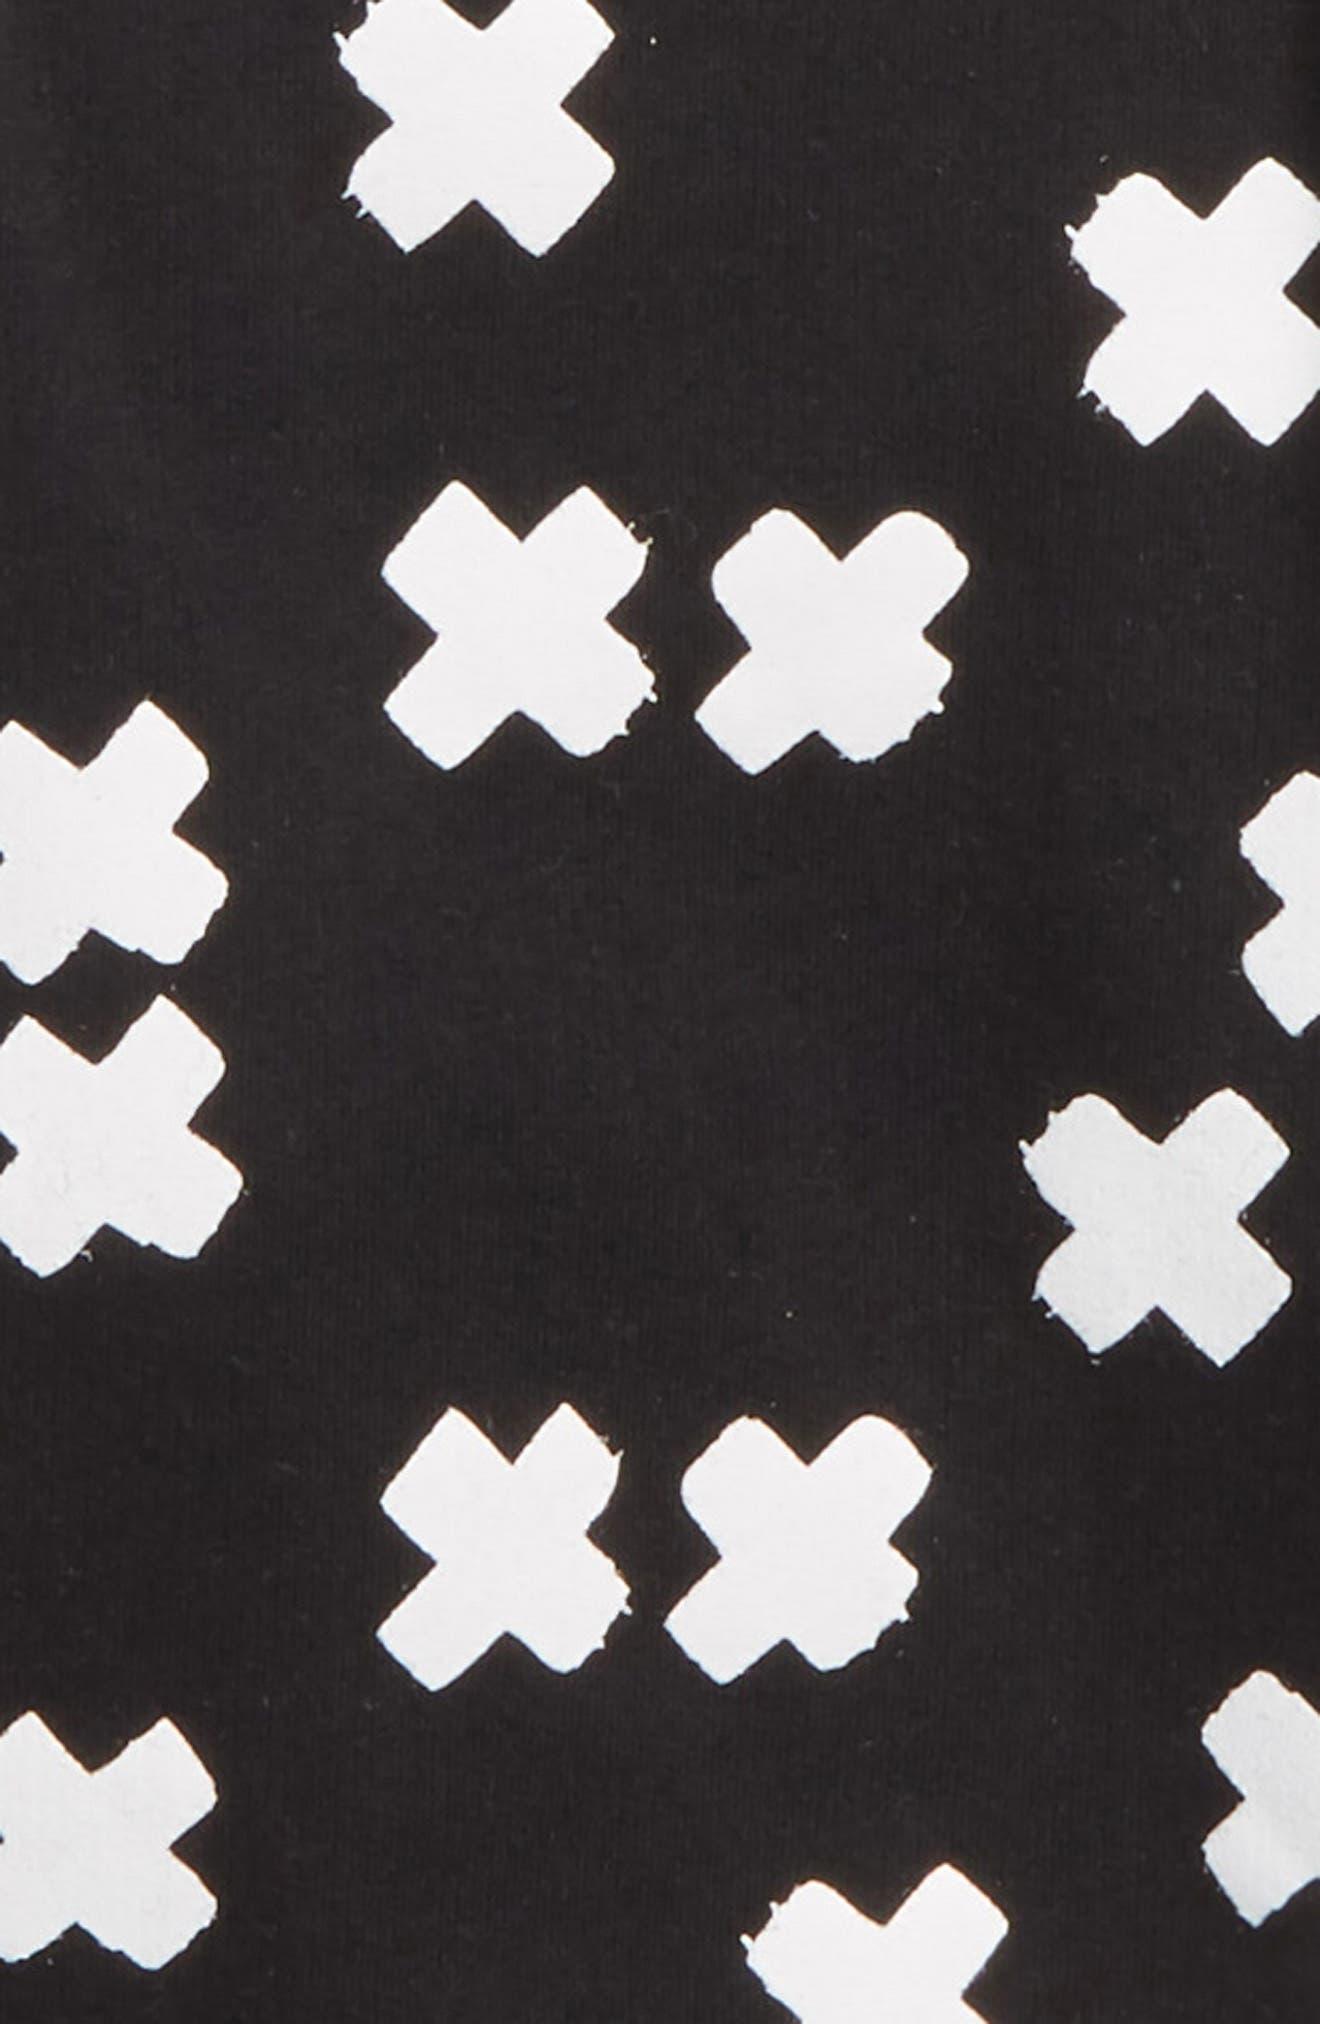 Tee & Short Overalls Set,                             Alternate thumbnail 2, color,                             X White/ Black